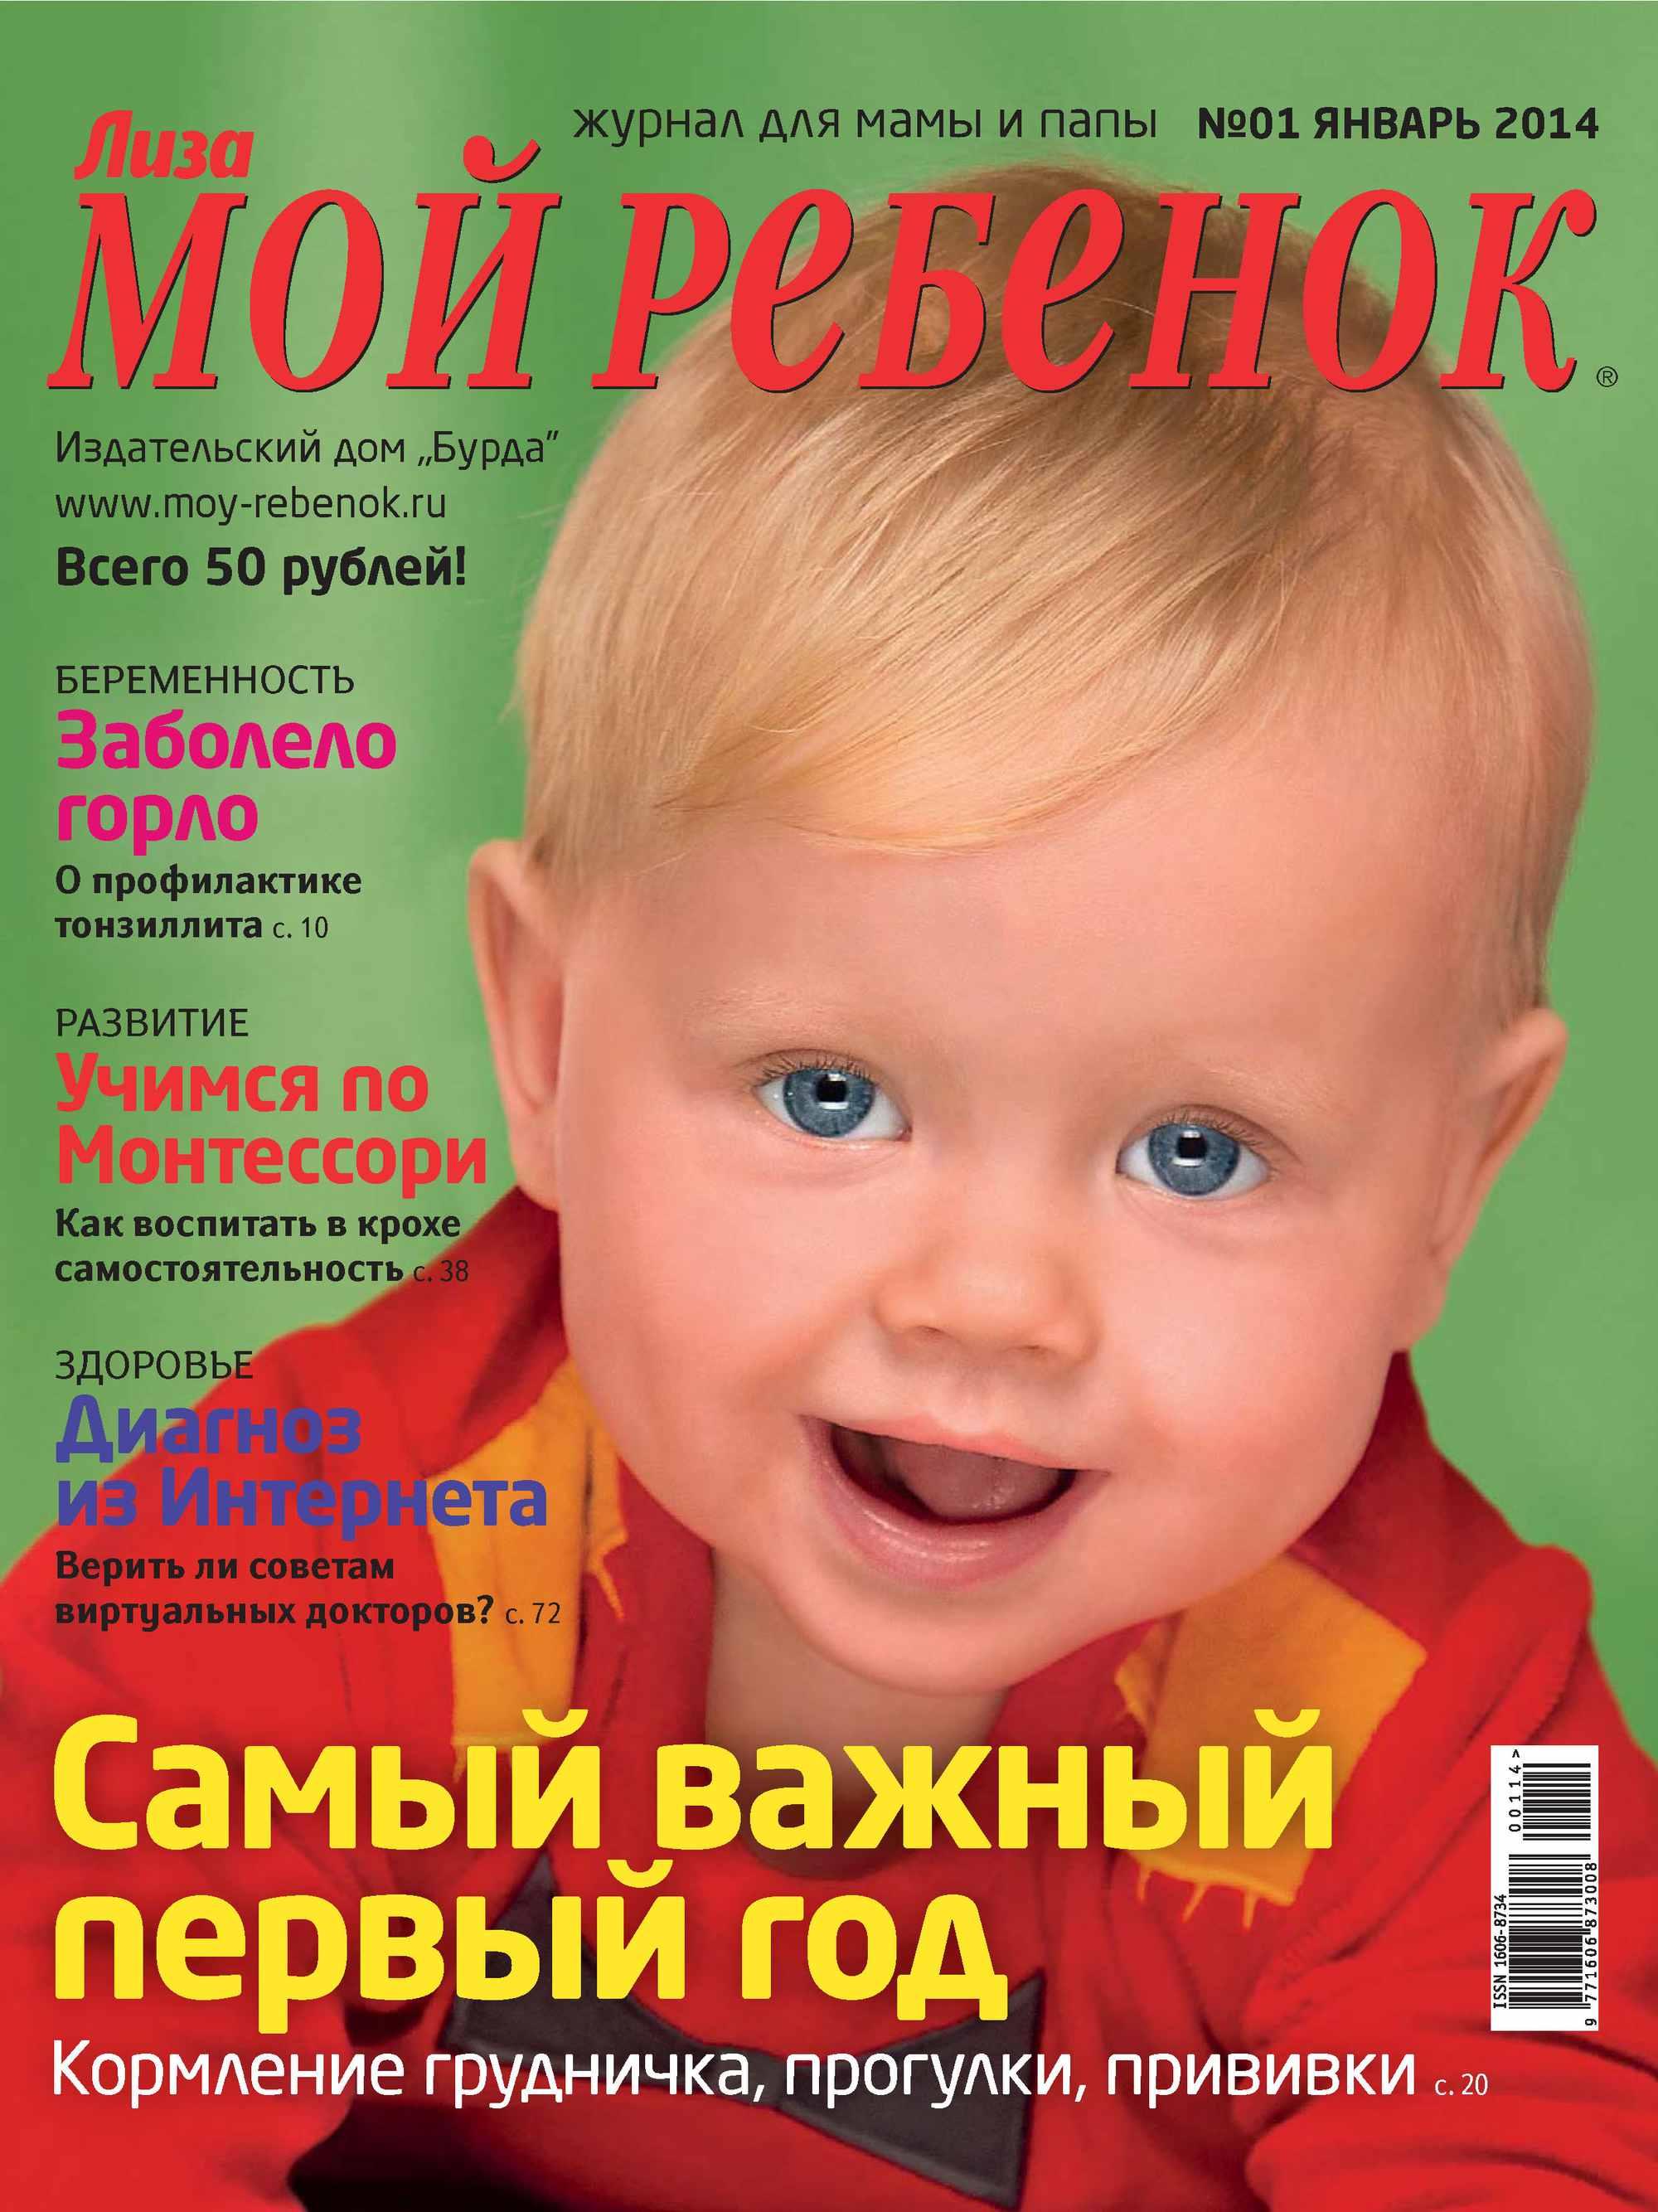 ИД «Бурда» Журнал «Лиза. Мой ребенок» №01/2014 ид бурда журнал лиза мой ребенок 11 2014